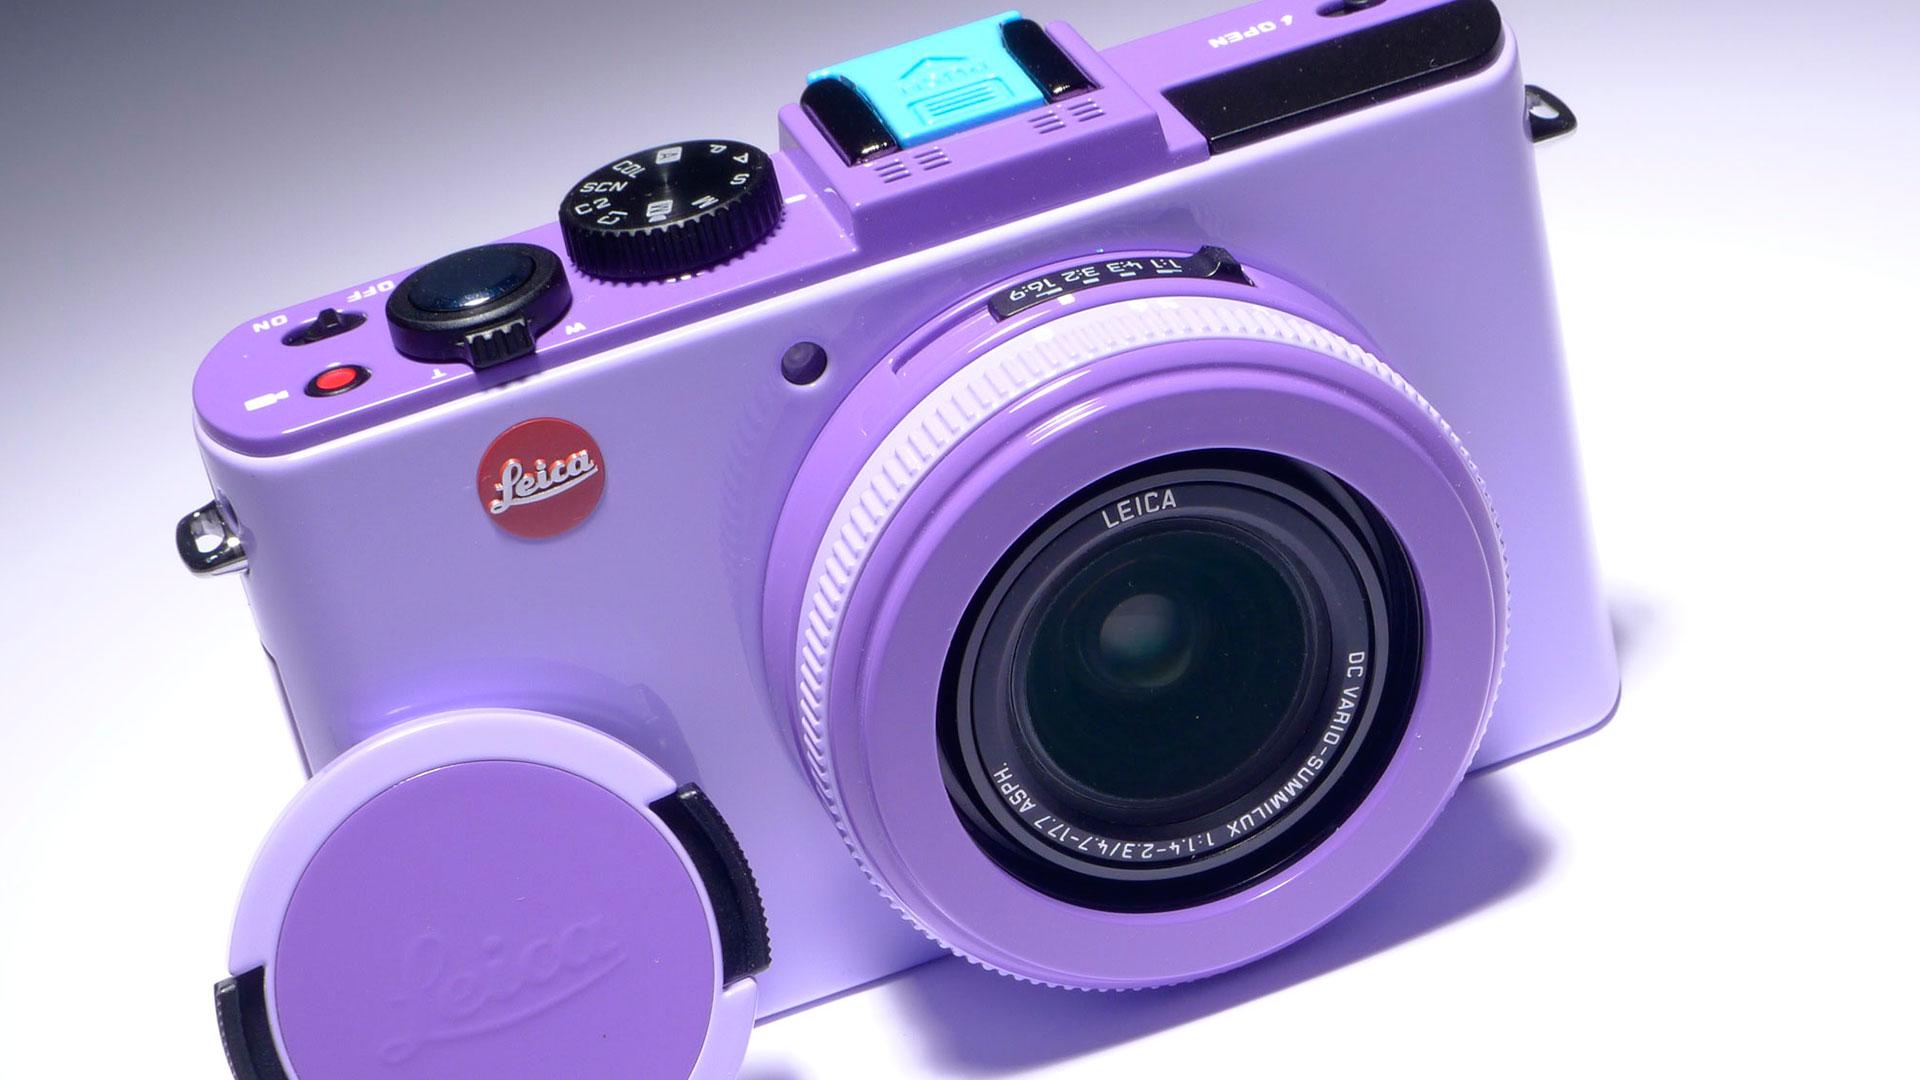 Leica Colorware hero asset